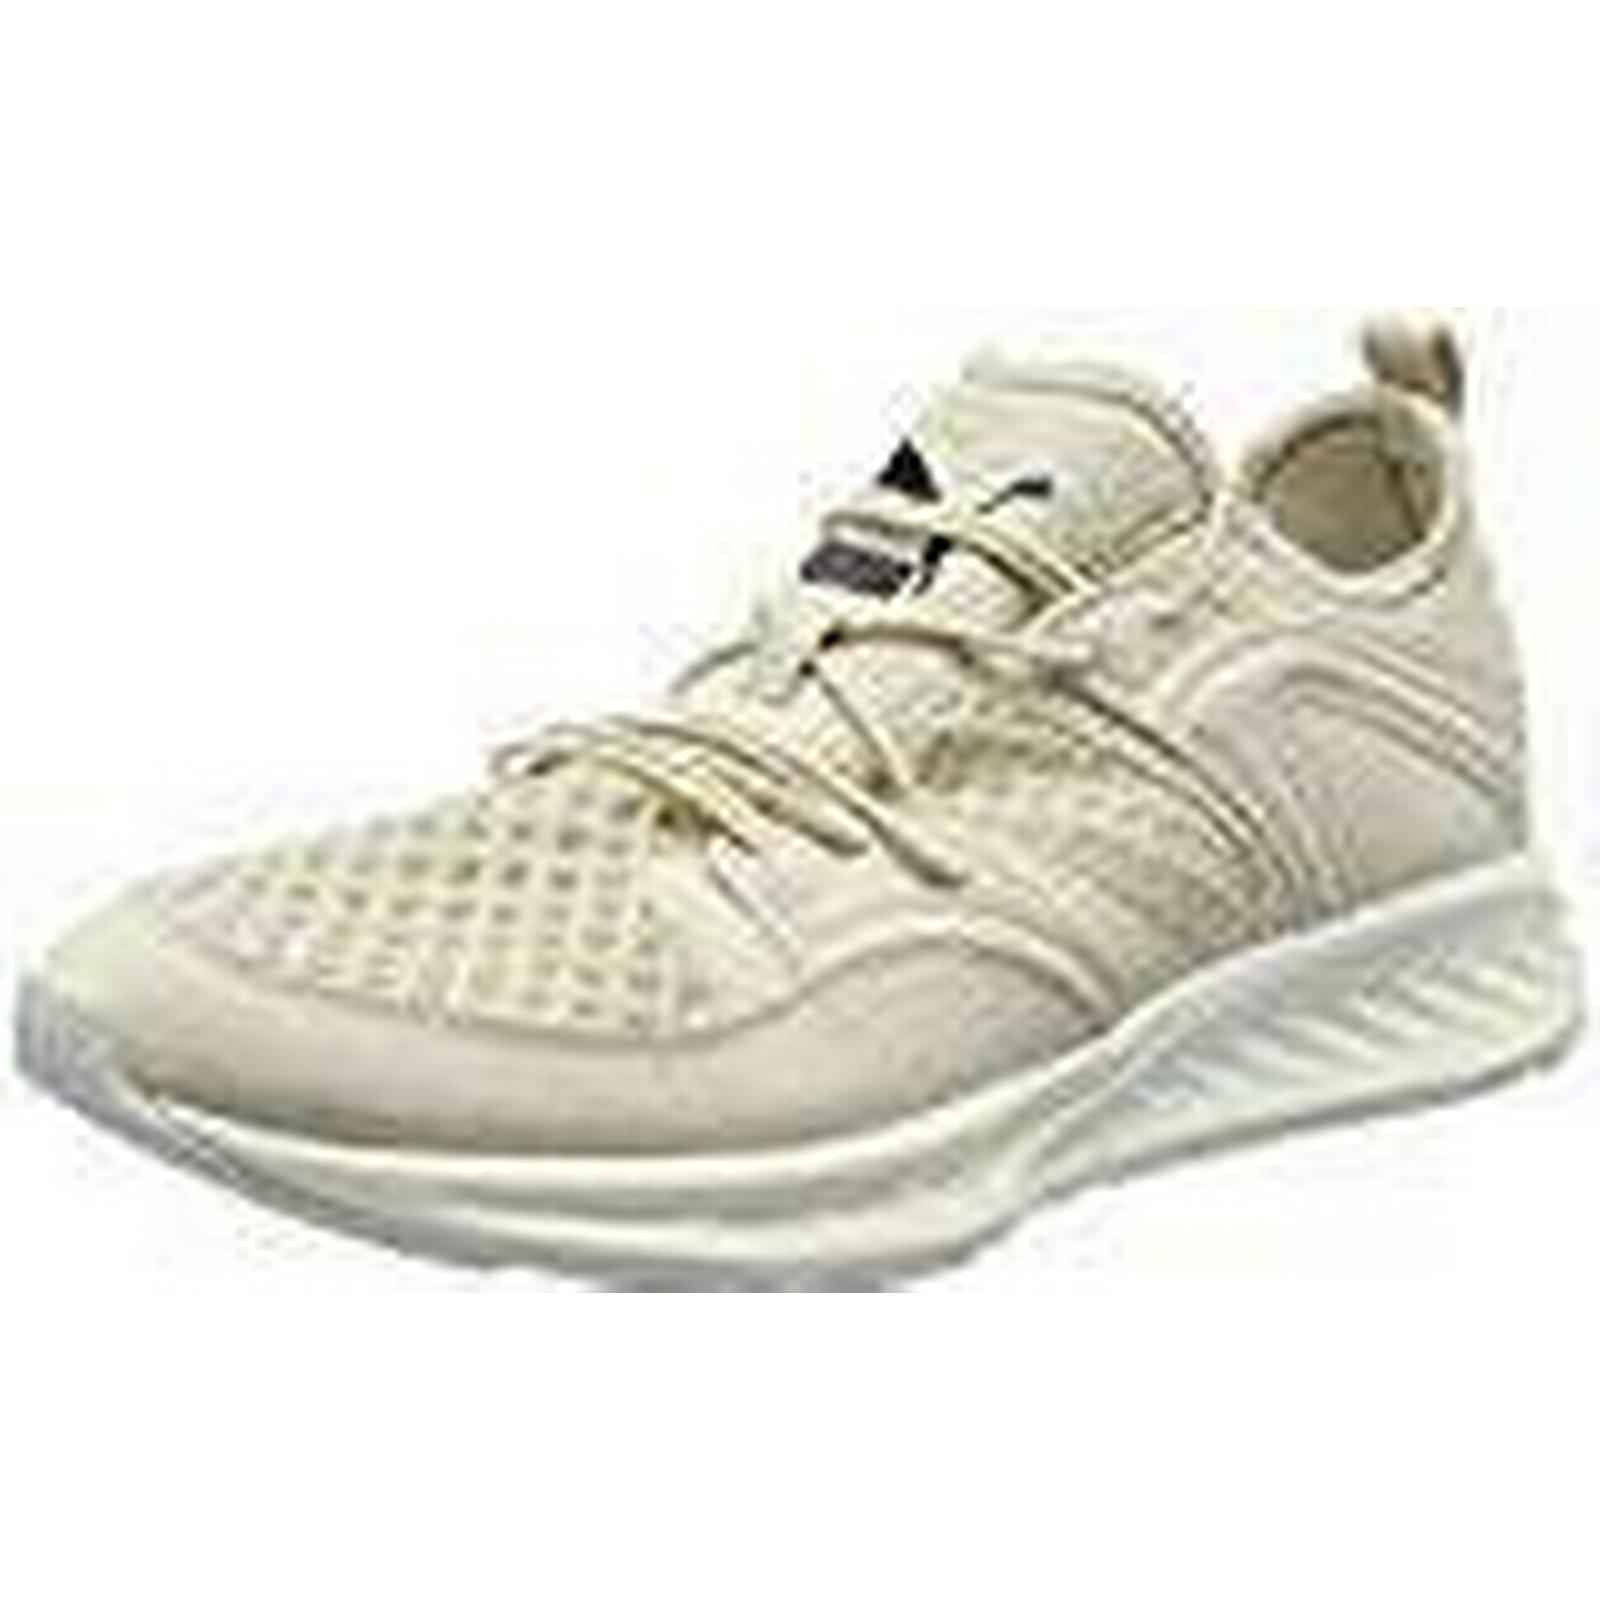 Puma Unisex Breathe Adults' Blaze Ignite Plus Breathe Unisex Low-Top Sneakers, Beige Oatmeal White 02, 6 UK 98b2f2